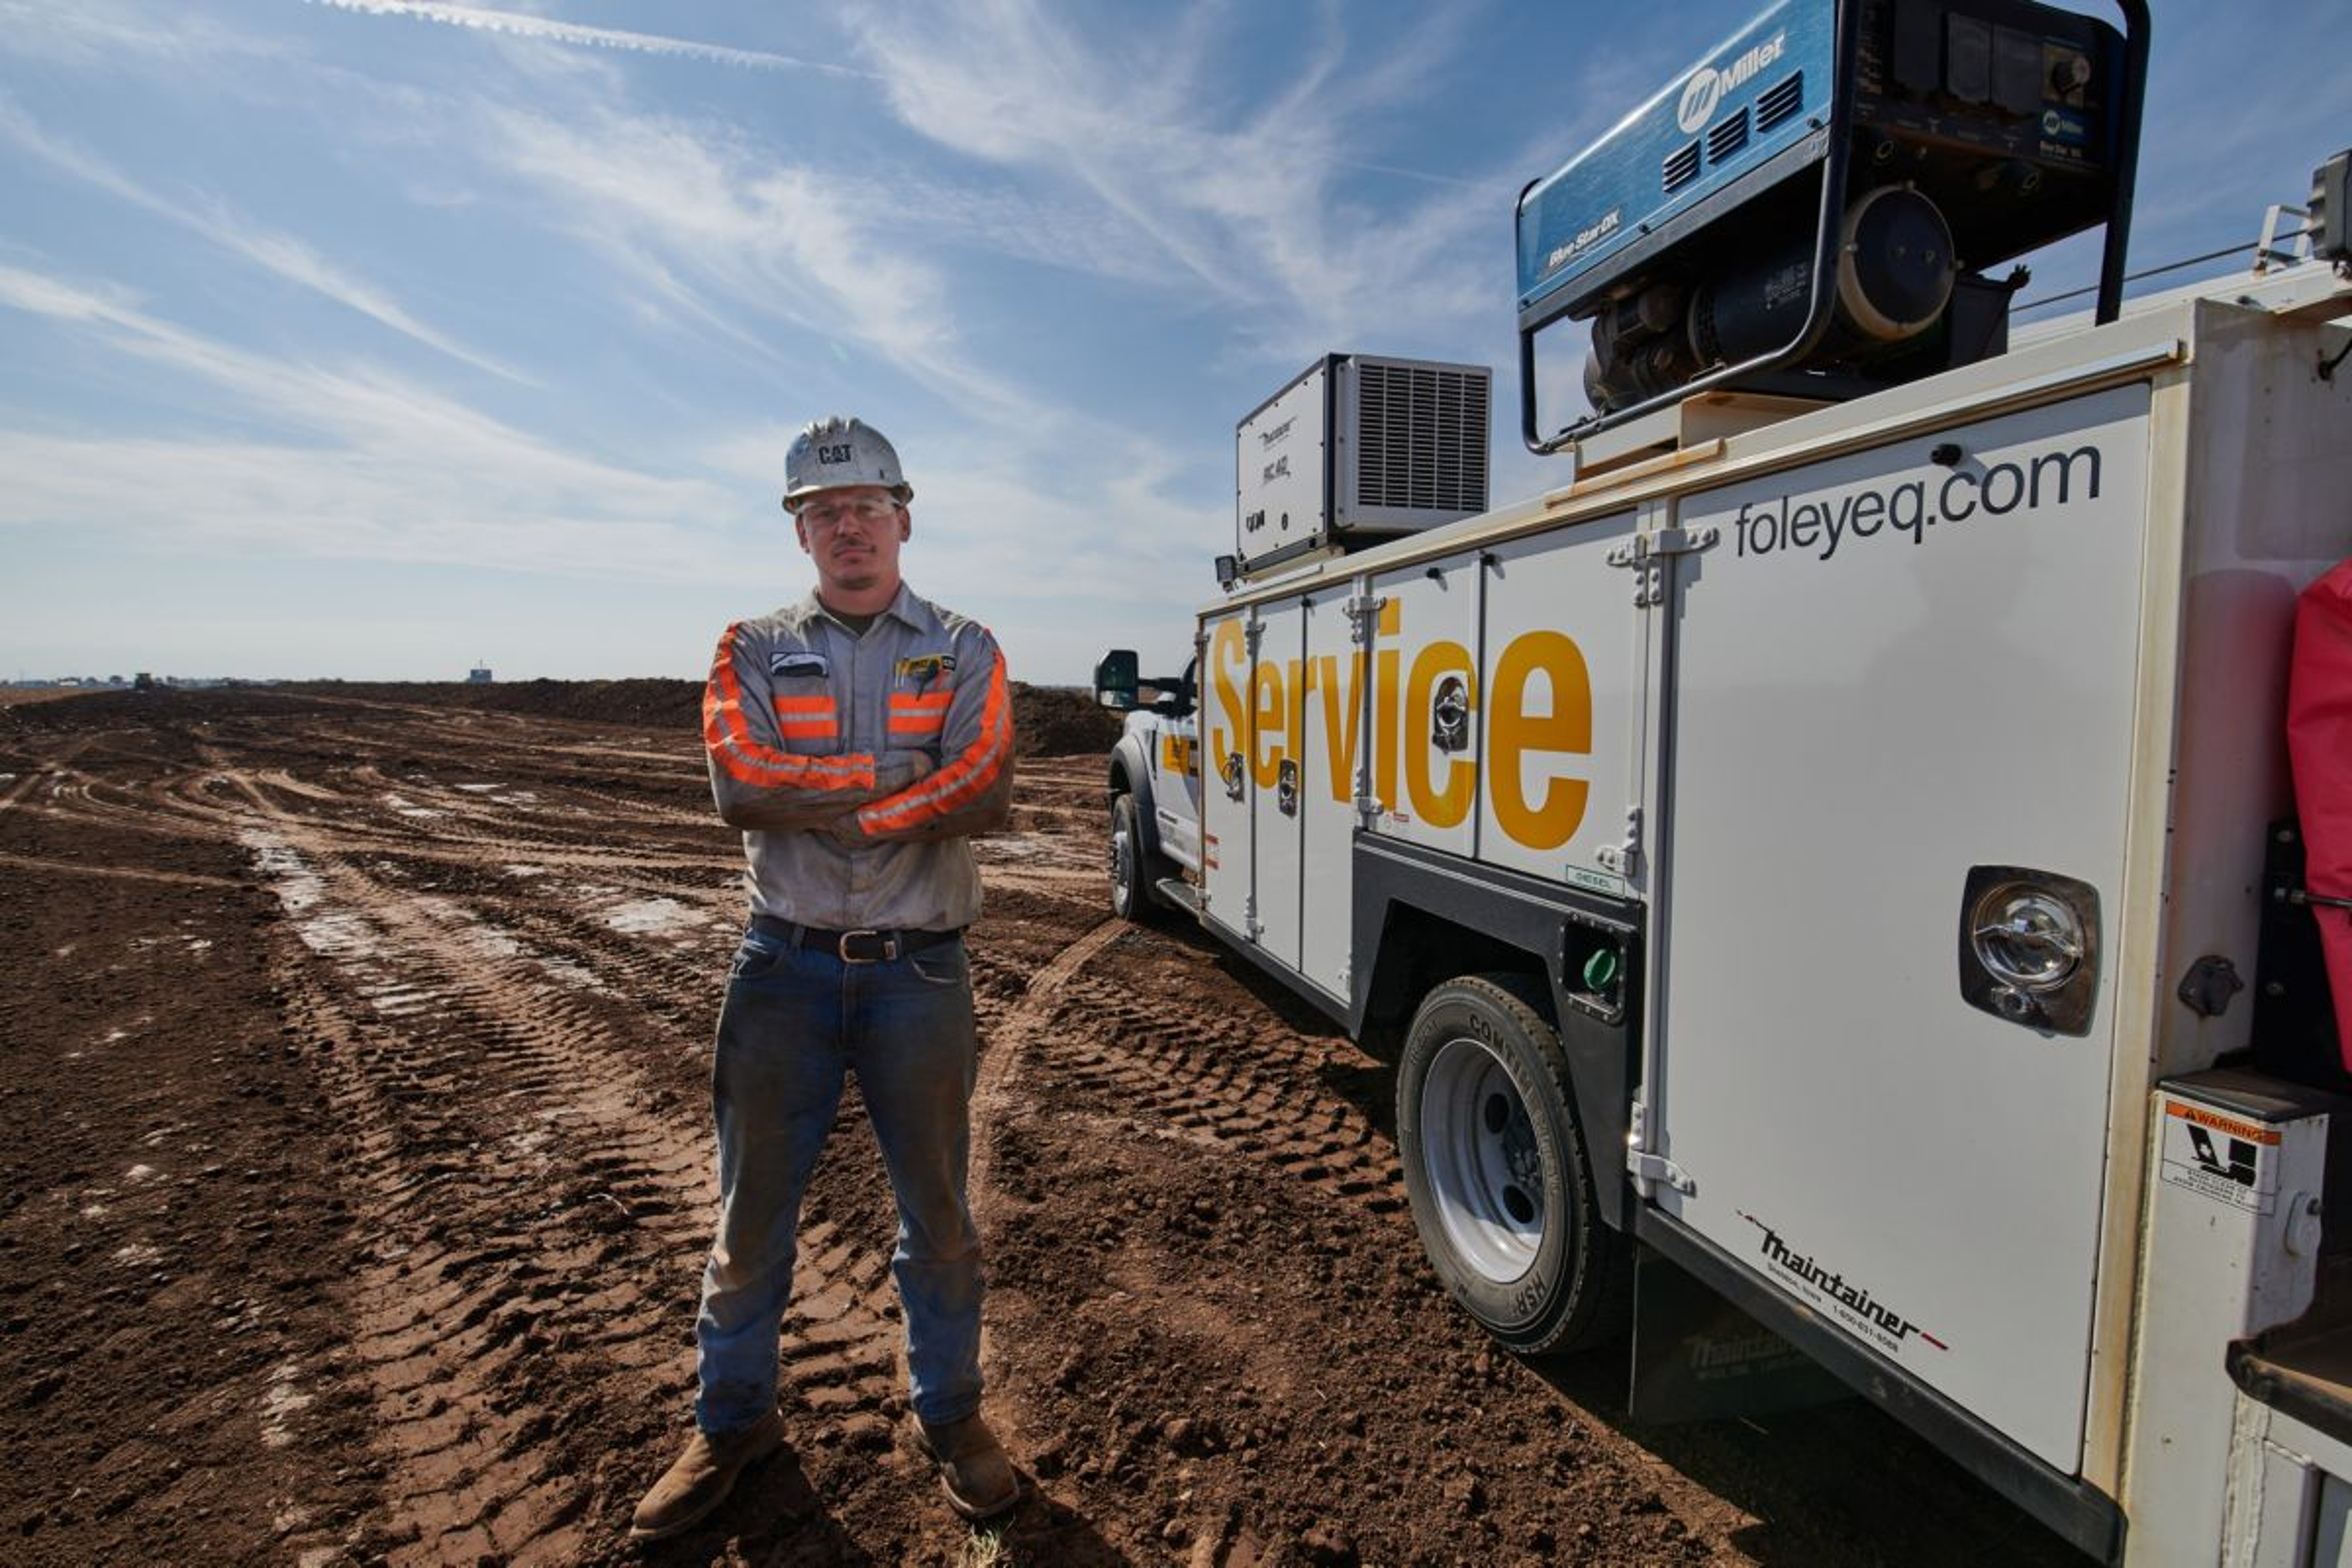 Technician by a service truck